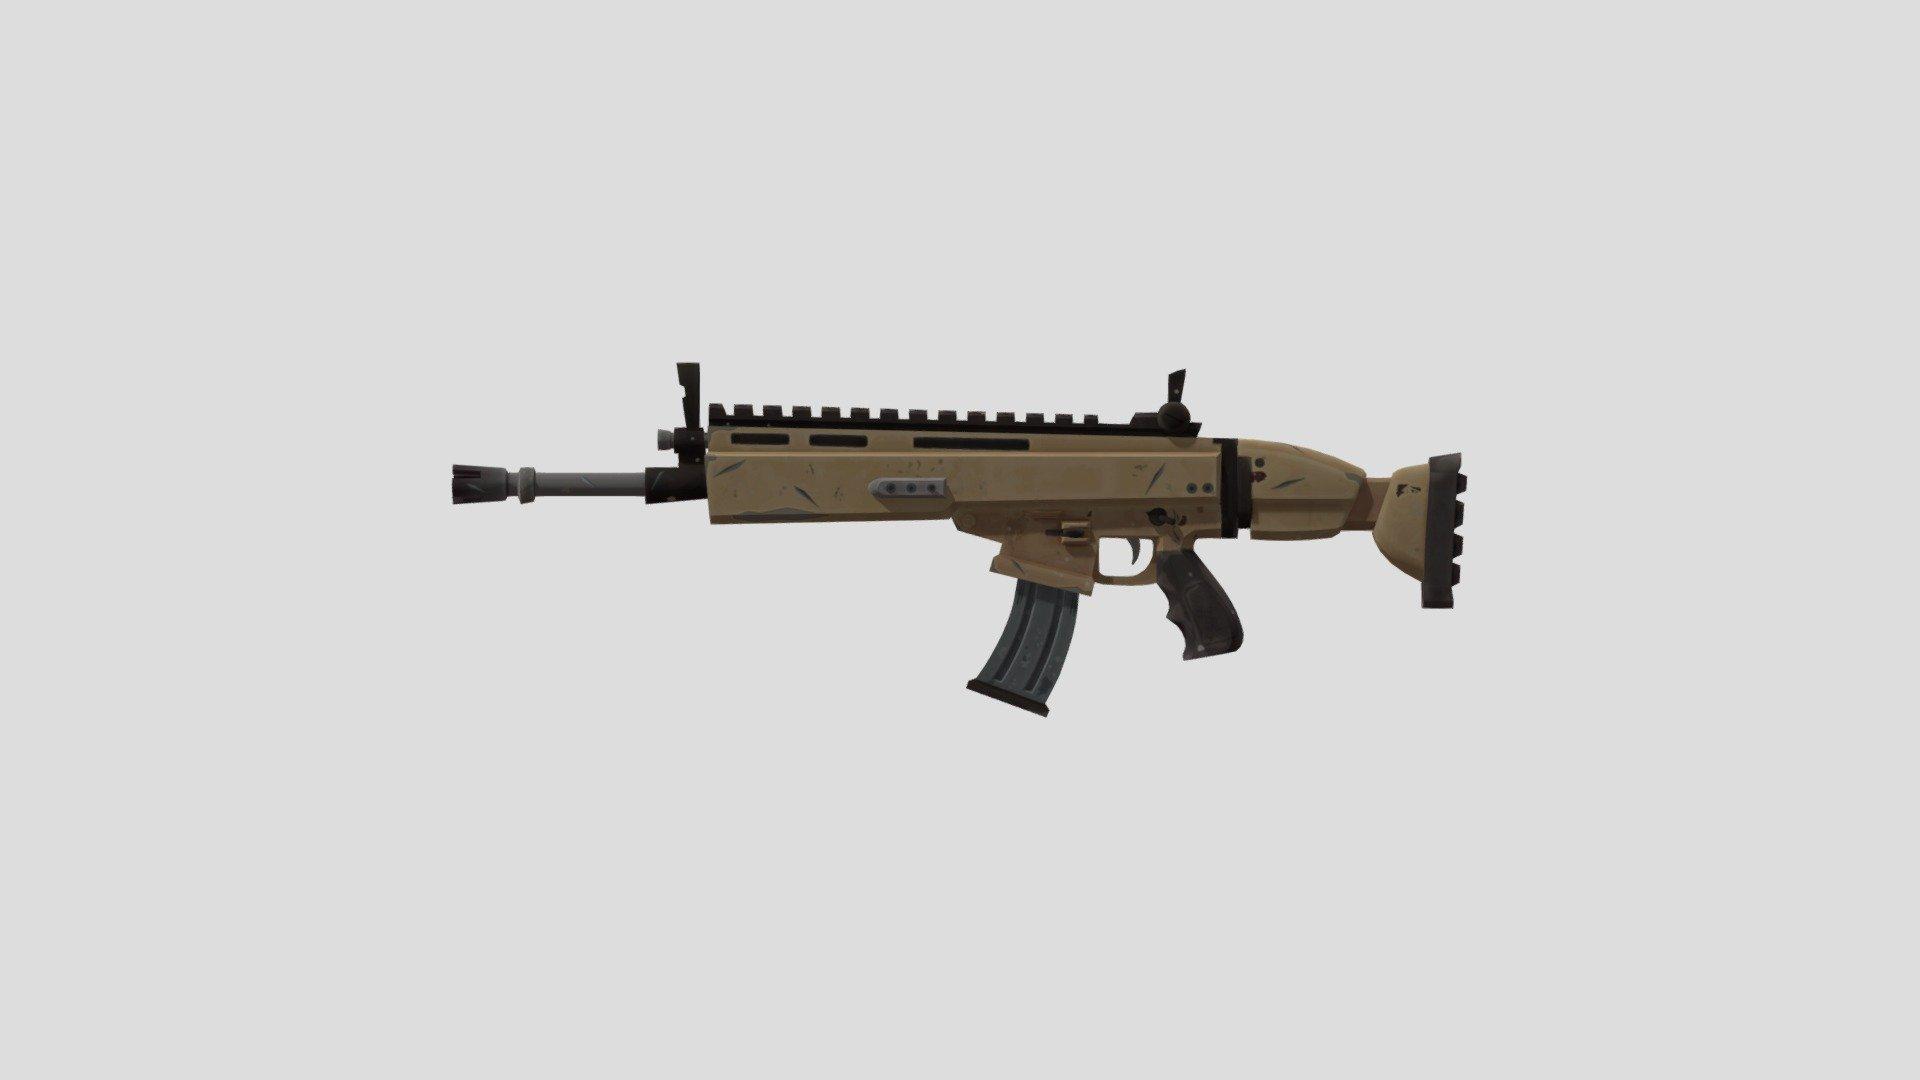 A Scar In Fortnite Scar Fortnite Gun Download Free 3d Model By Skyrush Skyrush F661b1f